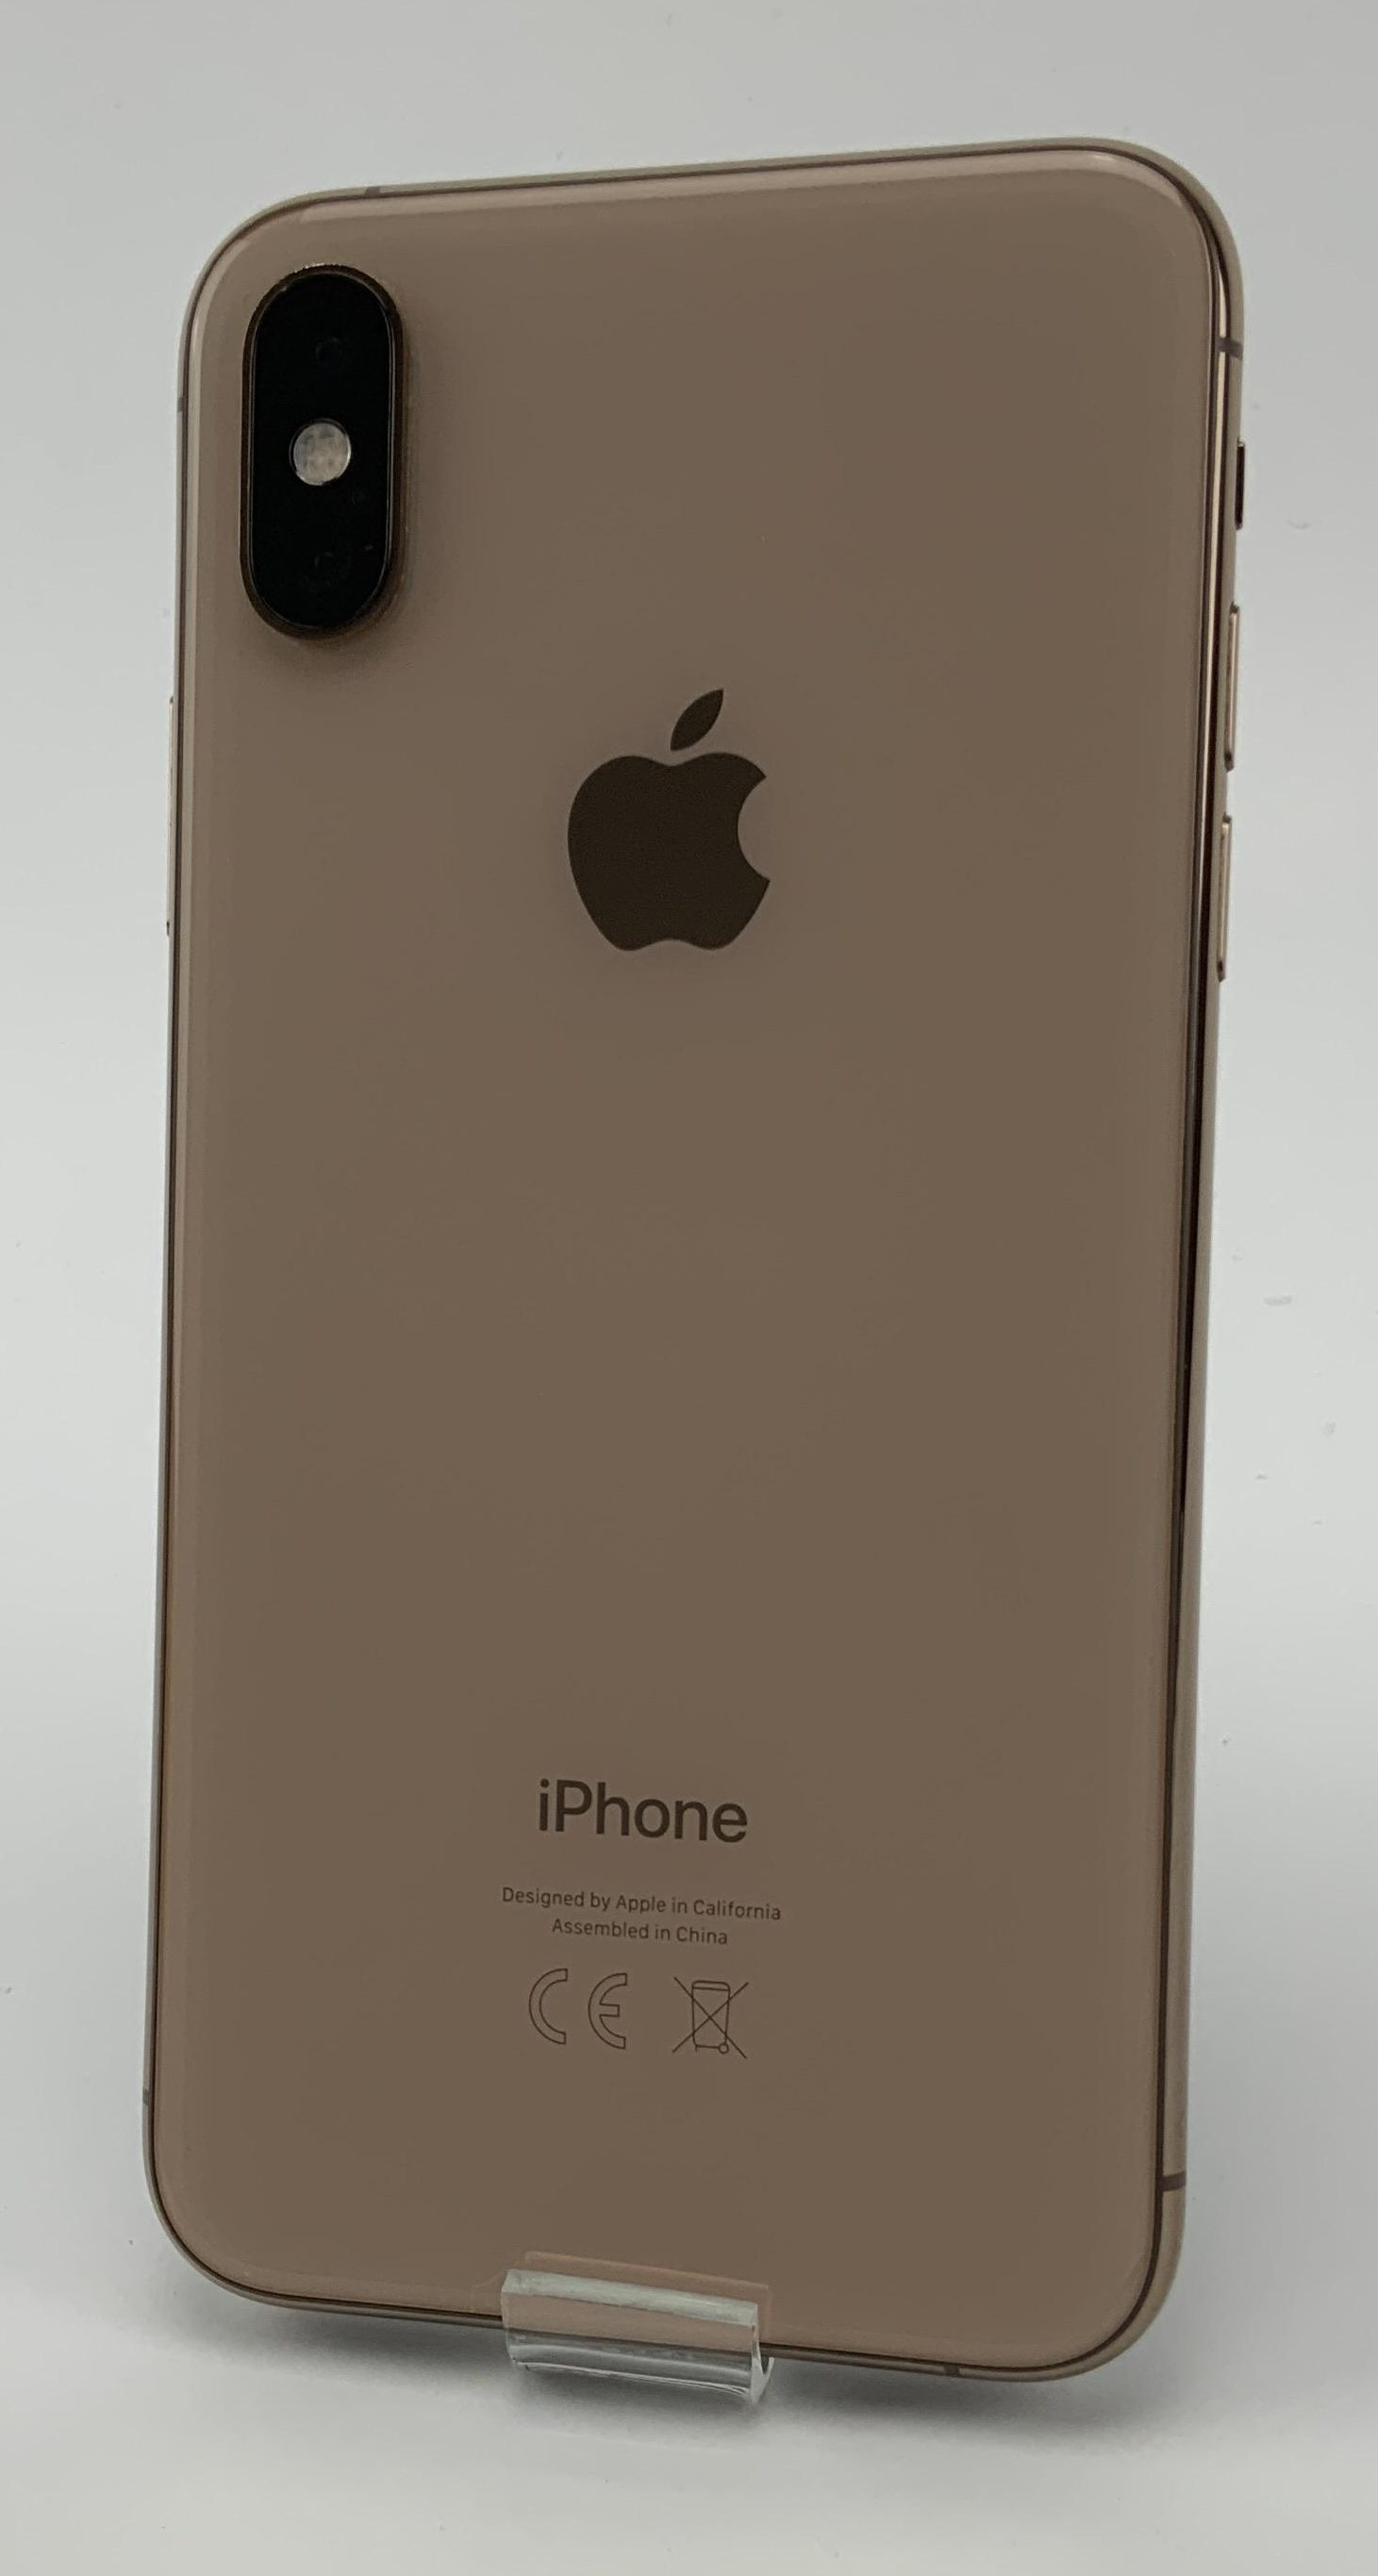 iPhone XS 64GB, 64GB, Gold, immagine 2